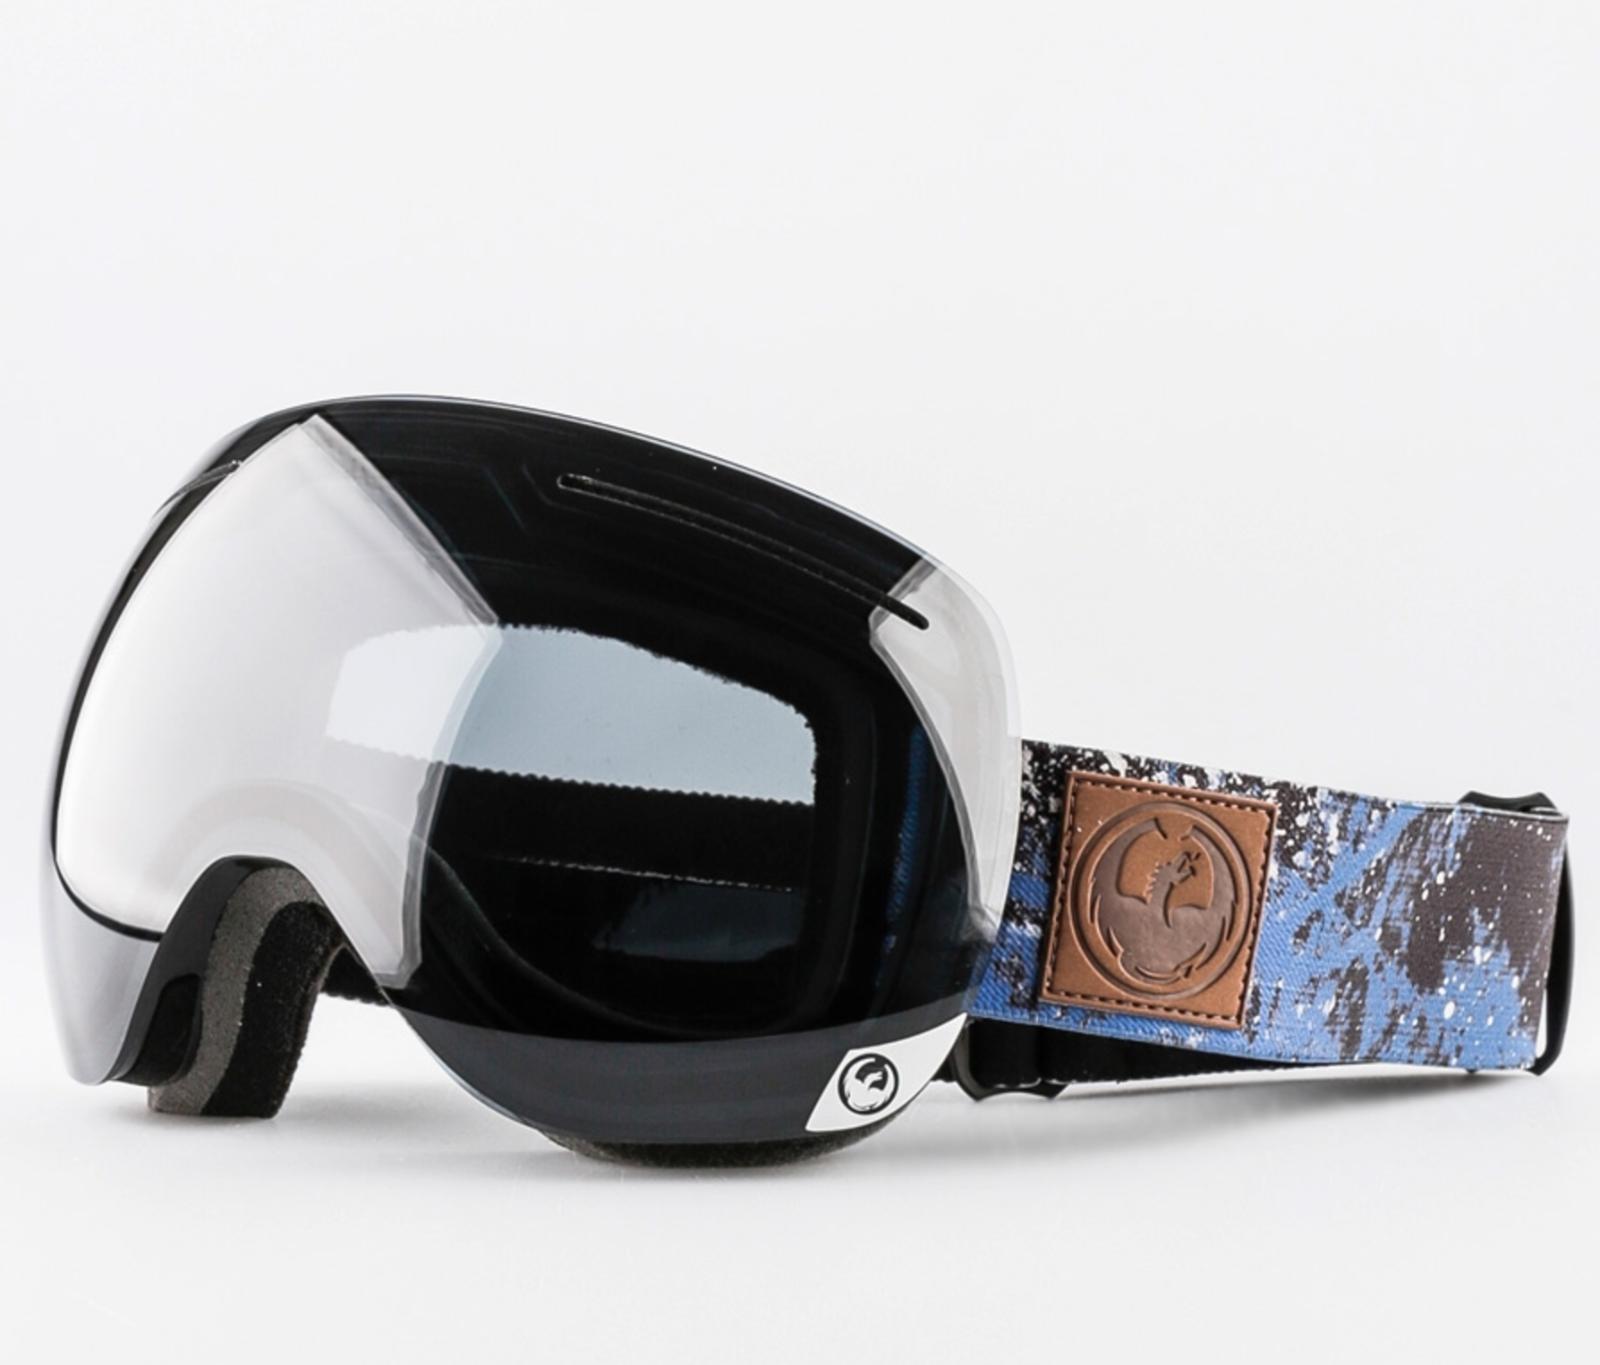 NEW Dragon X1 Goggles-Patina Blau-Dark Smoke+Gelb ROT Ion-SAME DAY SHIPPING